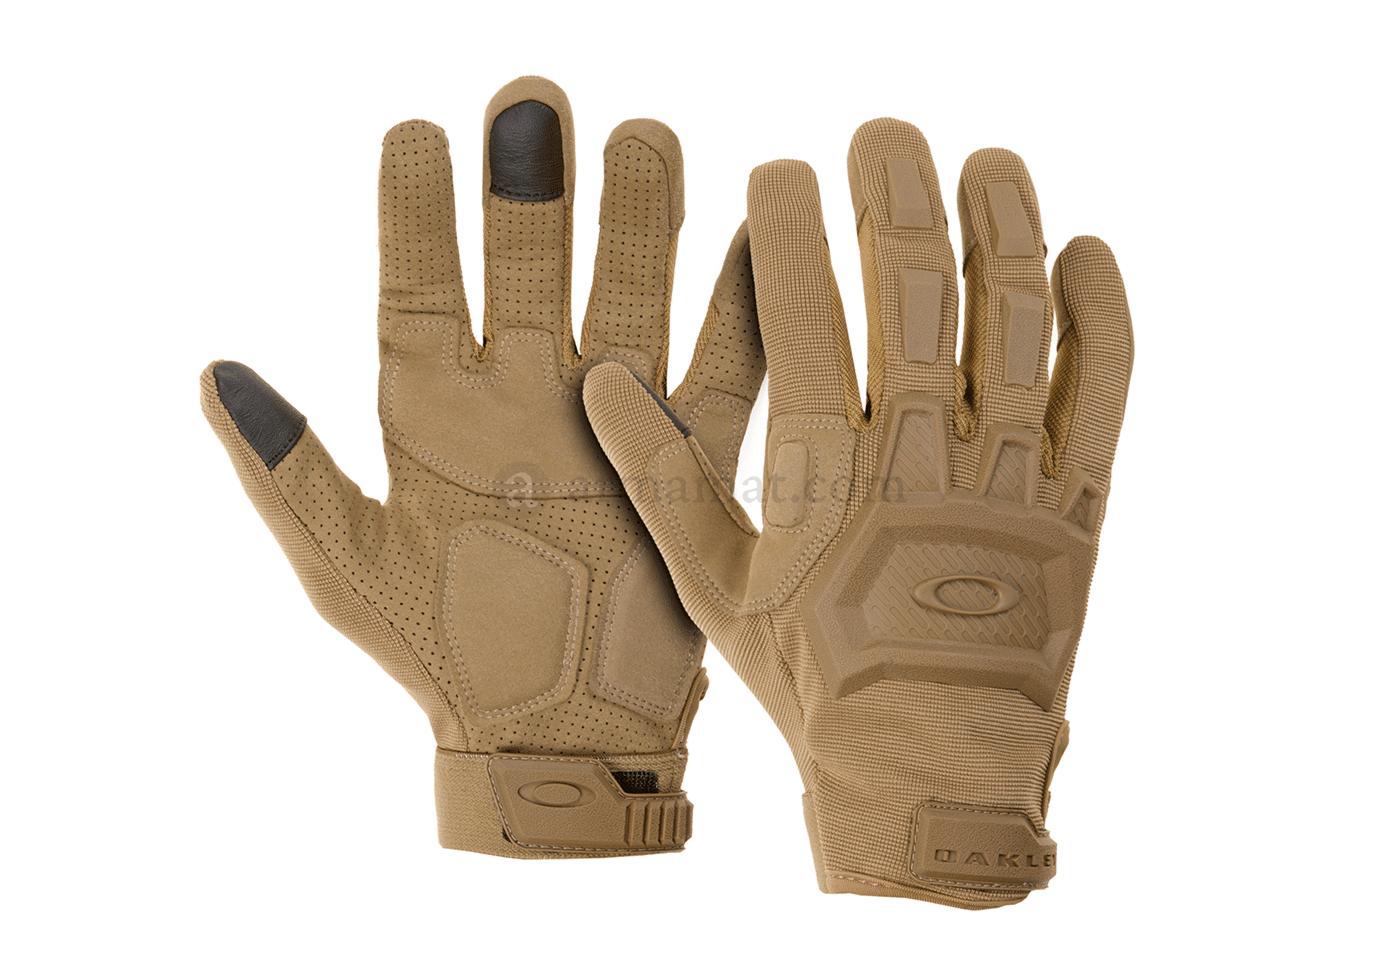 609c4f656e6 SI Flexion Gloves Coyote (Oakley) XL - Gloves - Garments - armamat ...